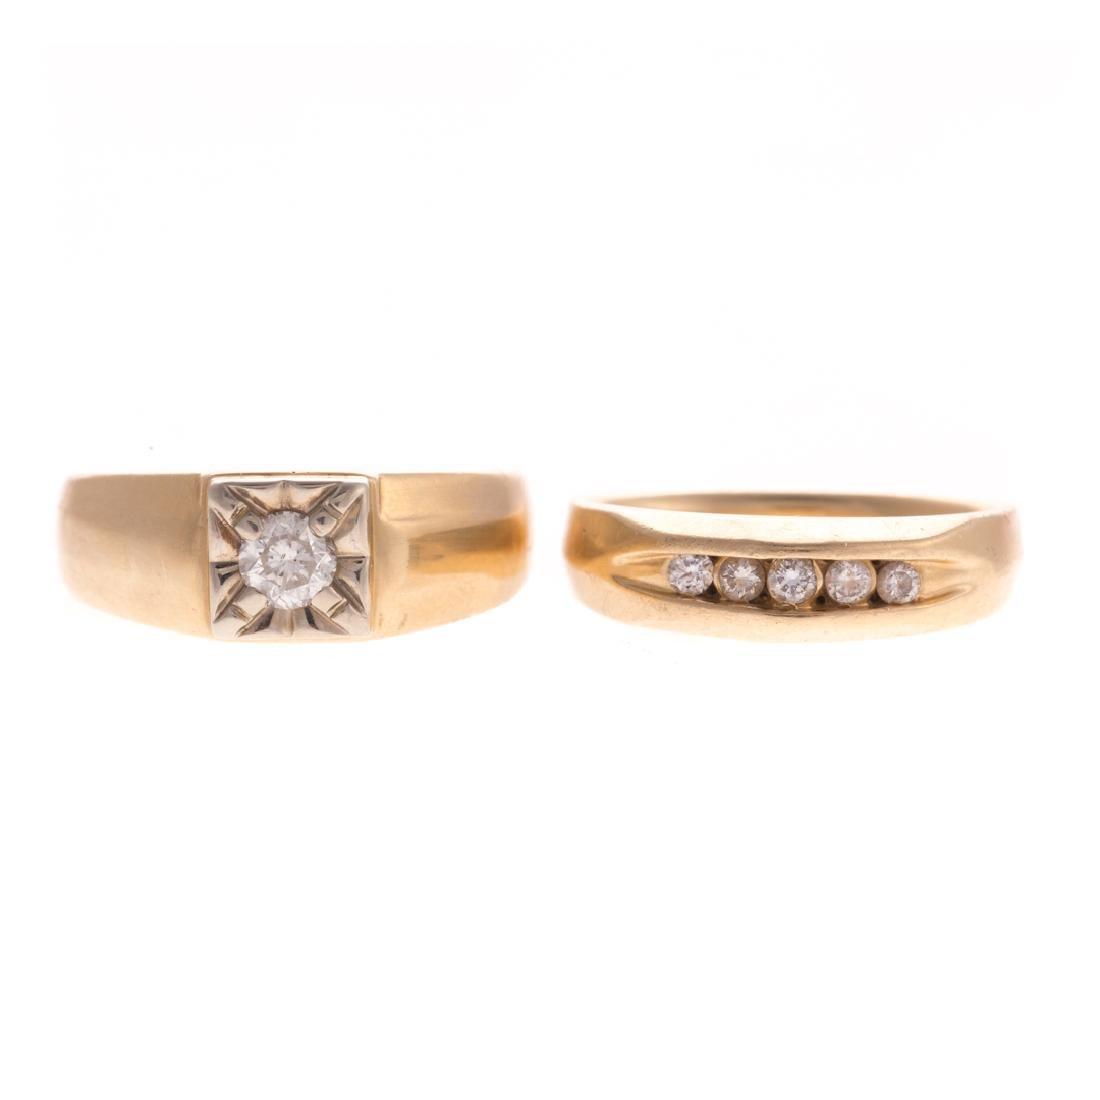 Two Gentlemen's Diamond Rings in 14K